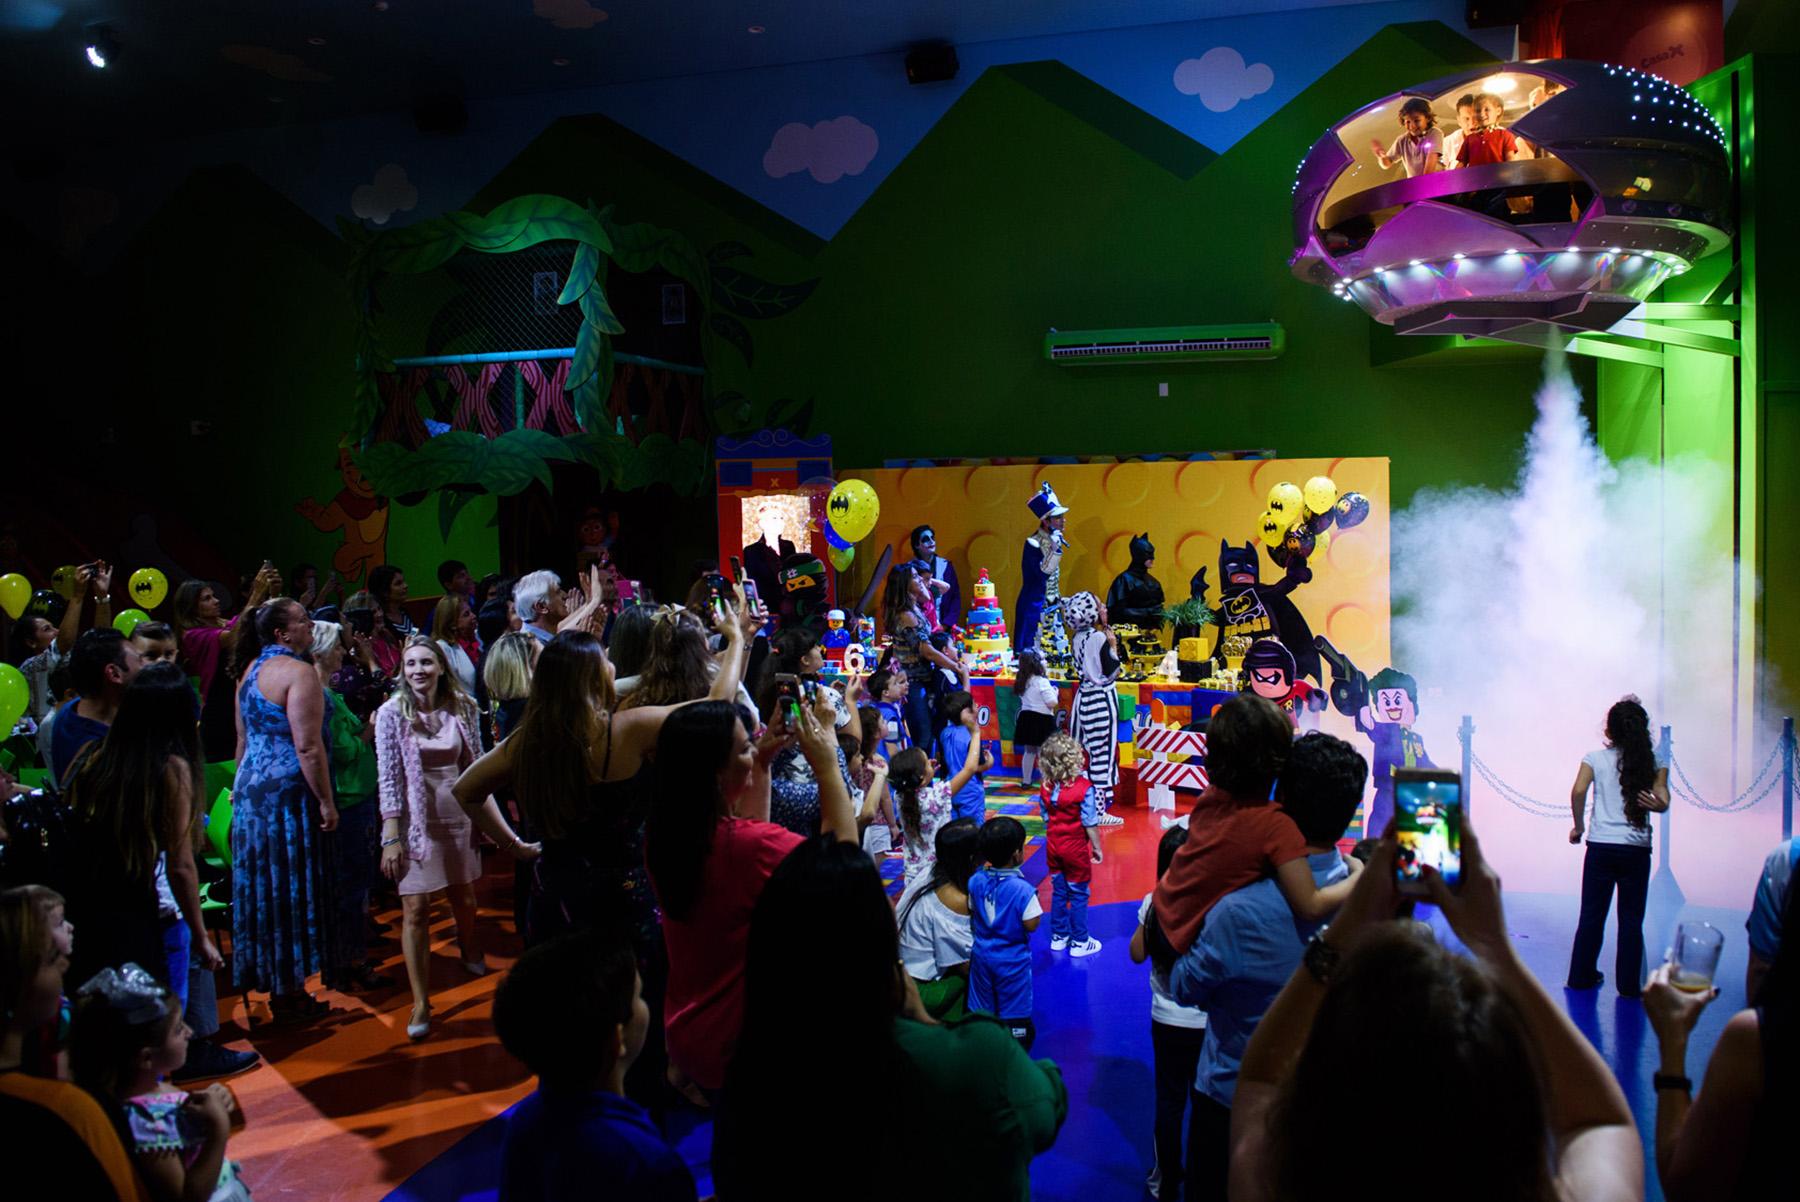 07-guswanderley-fotografia-infantil-curitiba-fotografo-criancas-festa-aniversario.jpg